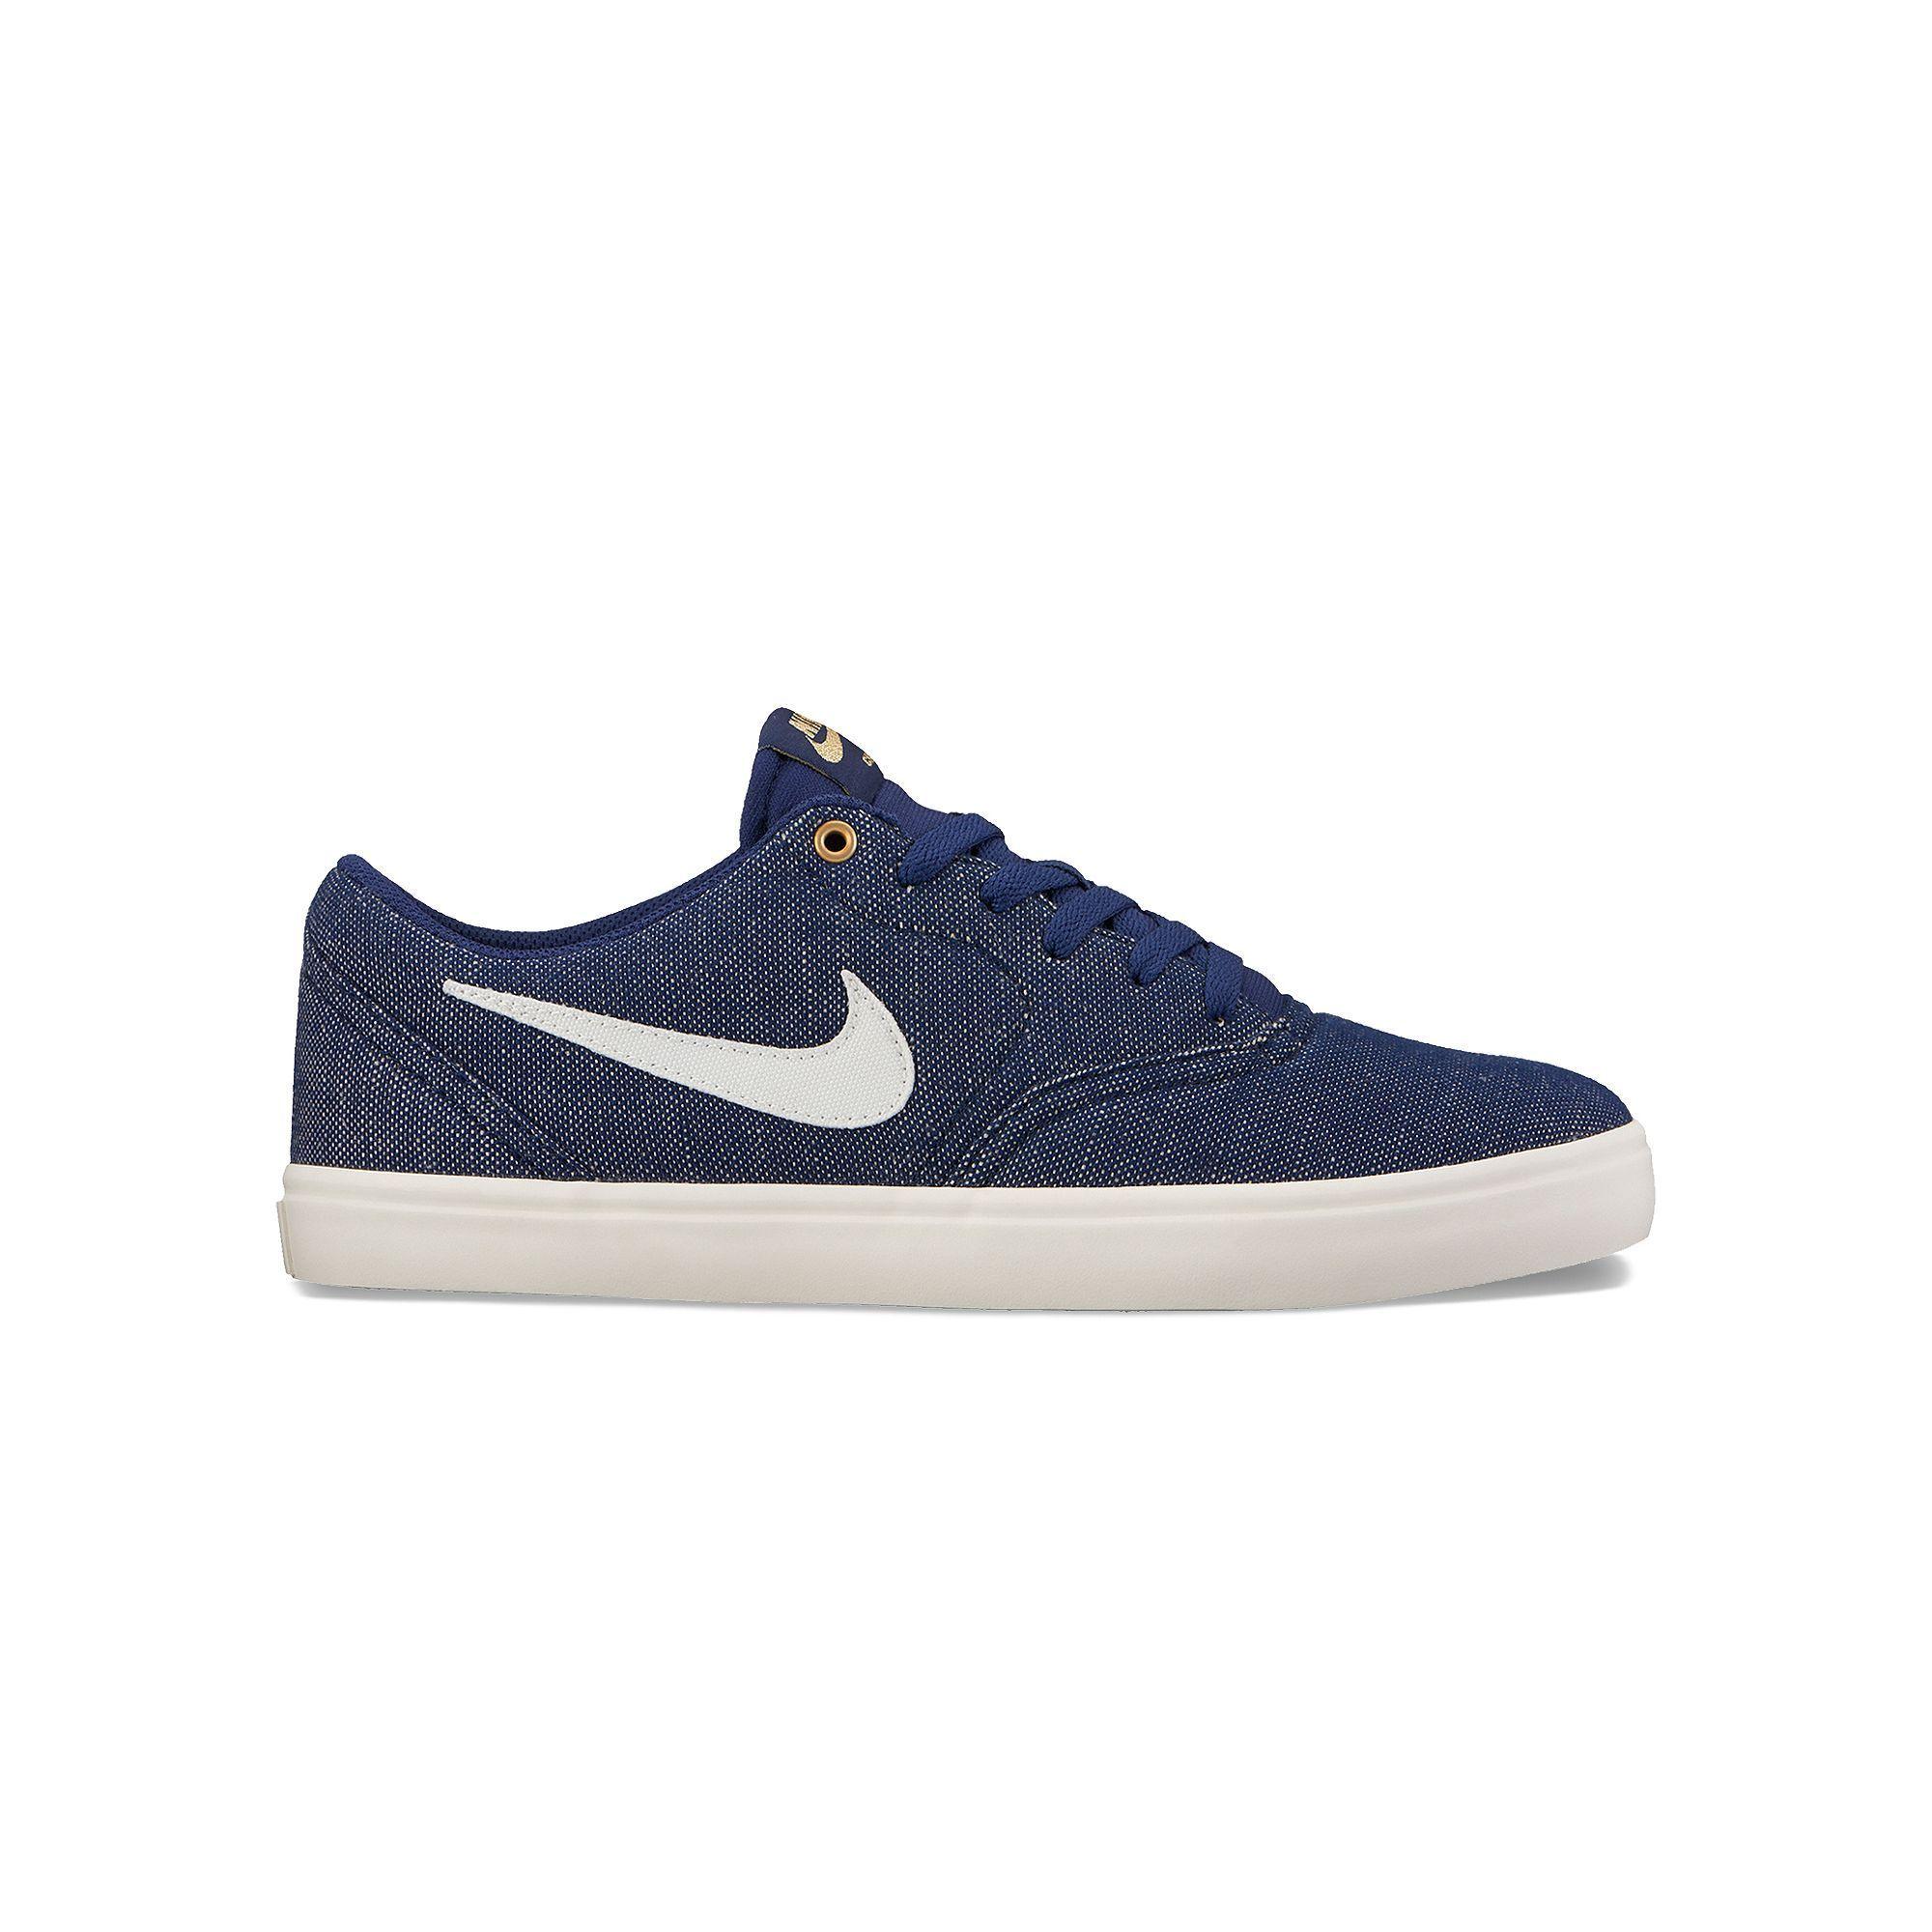 fba5b9dc3099 Nike SB Check Solarsoft Canvas Premium Men s Skate Shoes